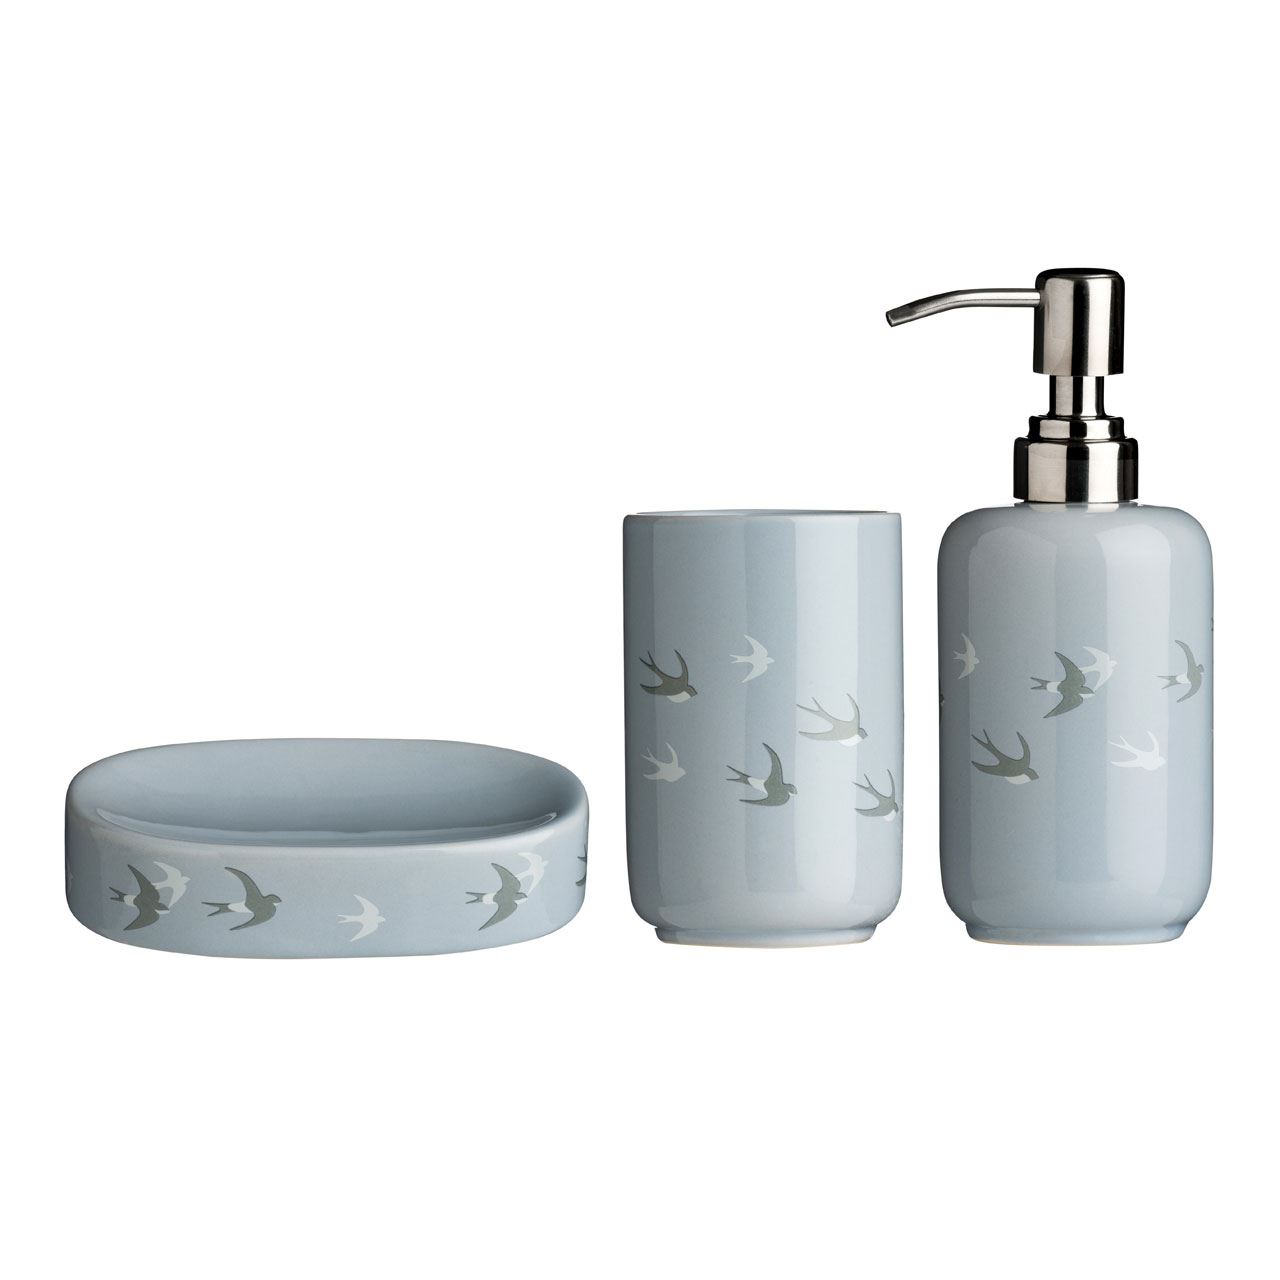 3-Piece Natural Premier Housewares Moon Bathroom Set